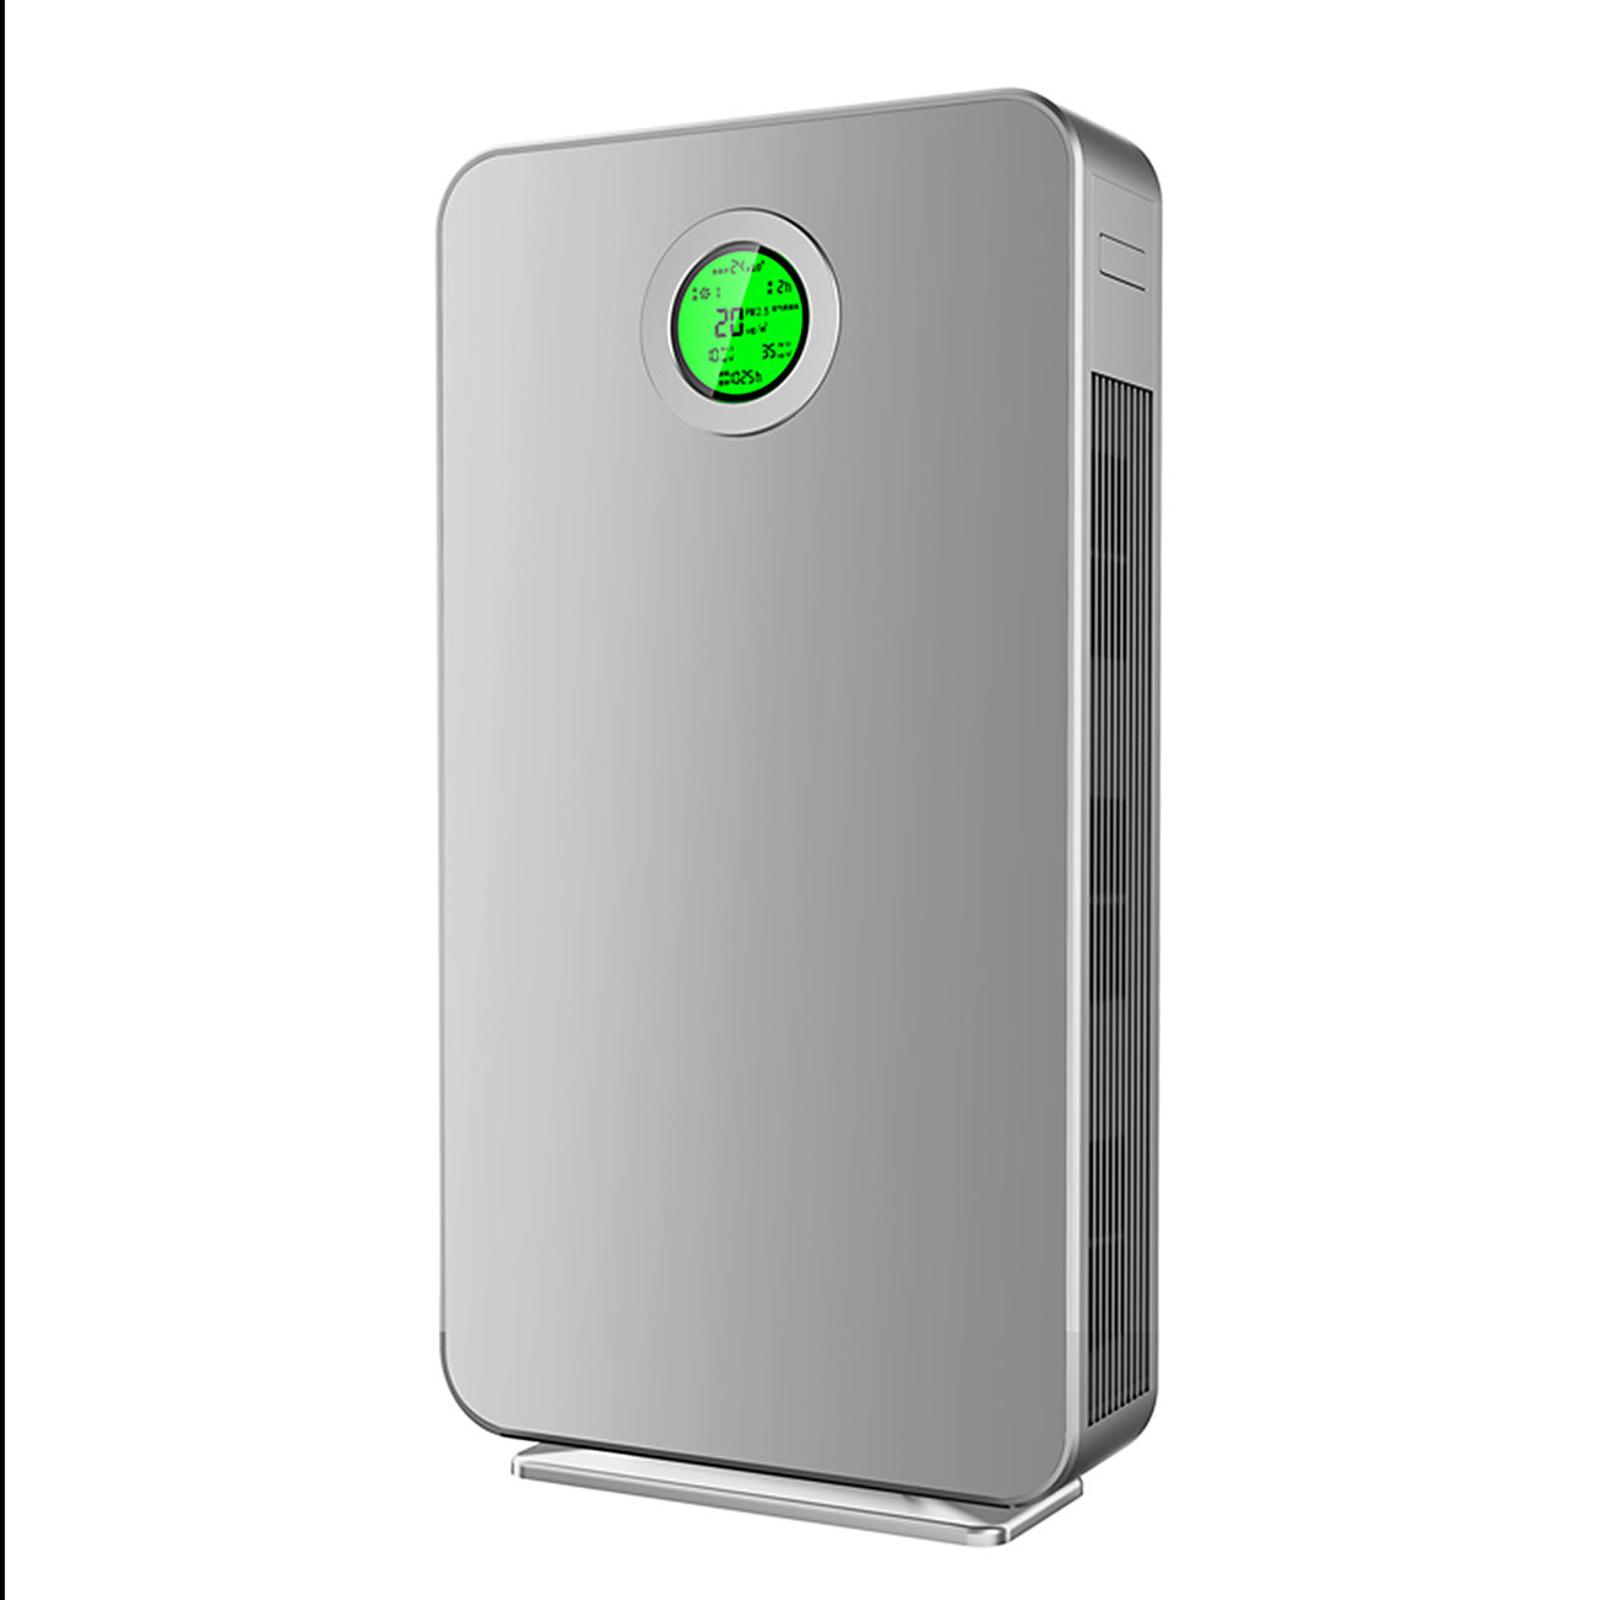 NEVOOX LF 2020 UV-C Luftreiniger